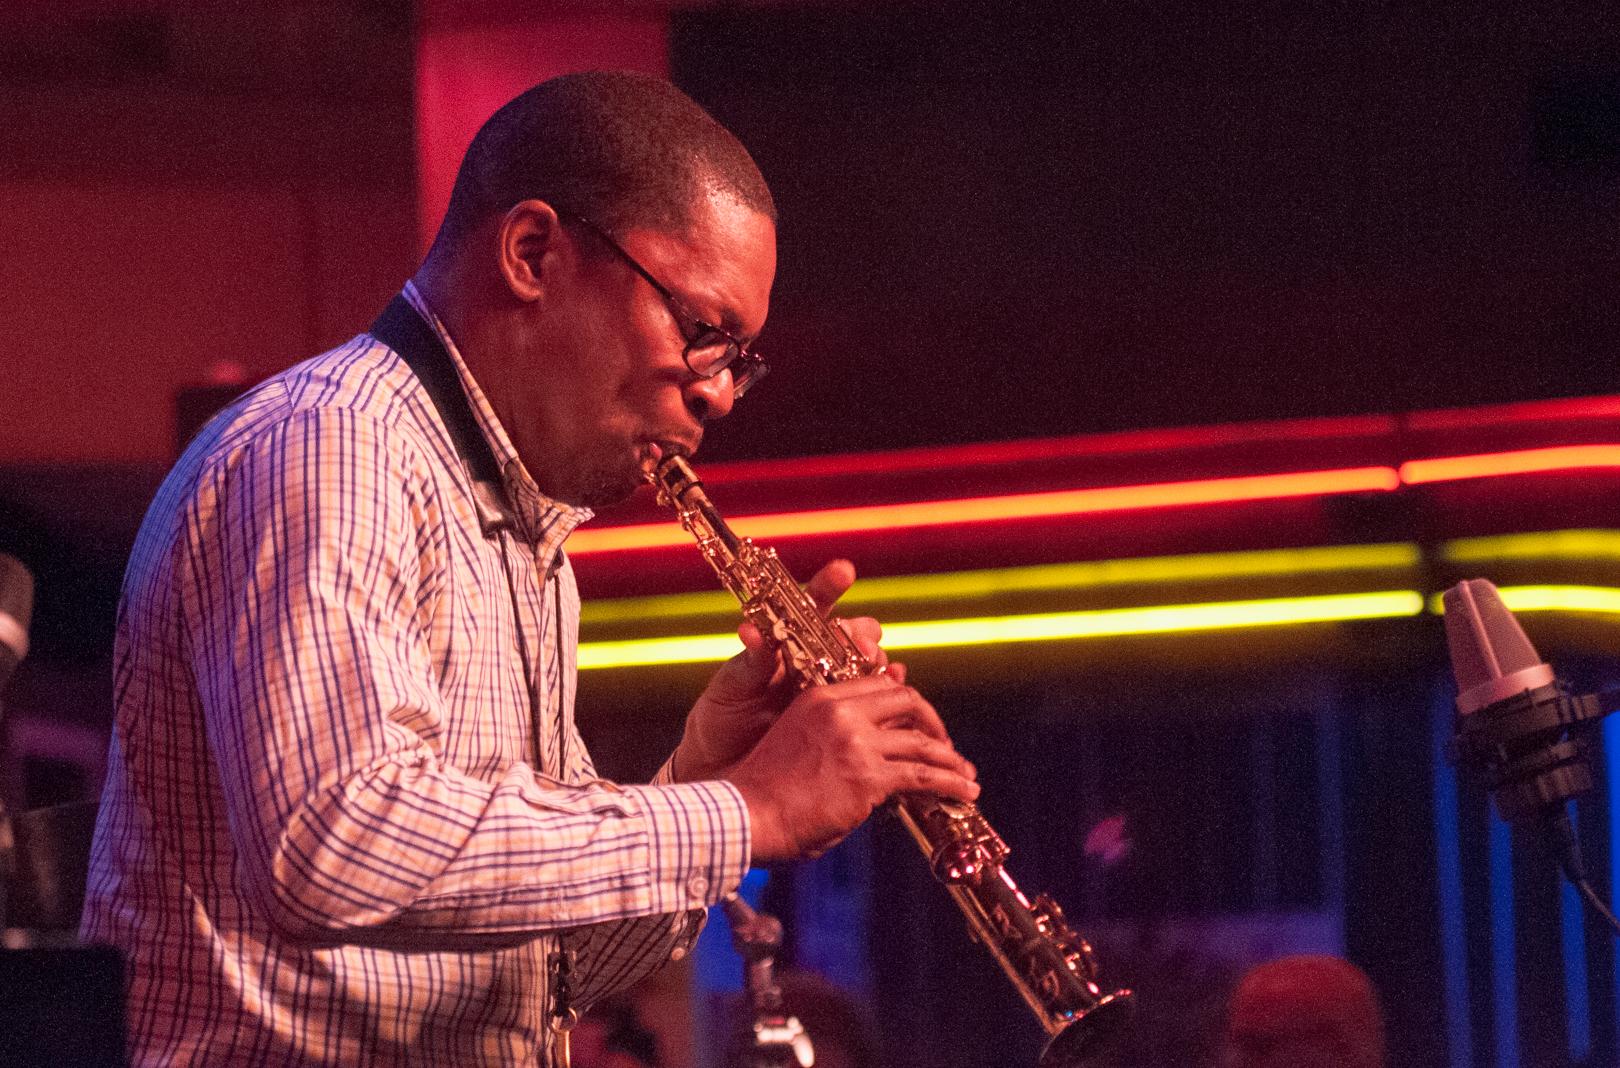 Ravi Coltrane with Quartet at Birdland Jazz Club in Nyc